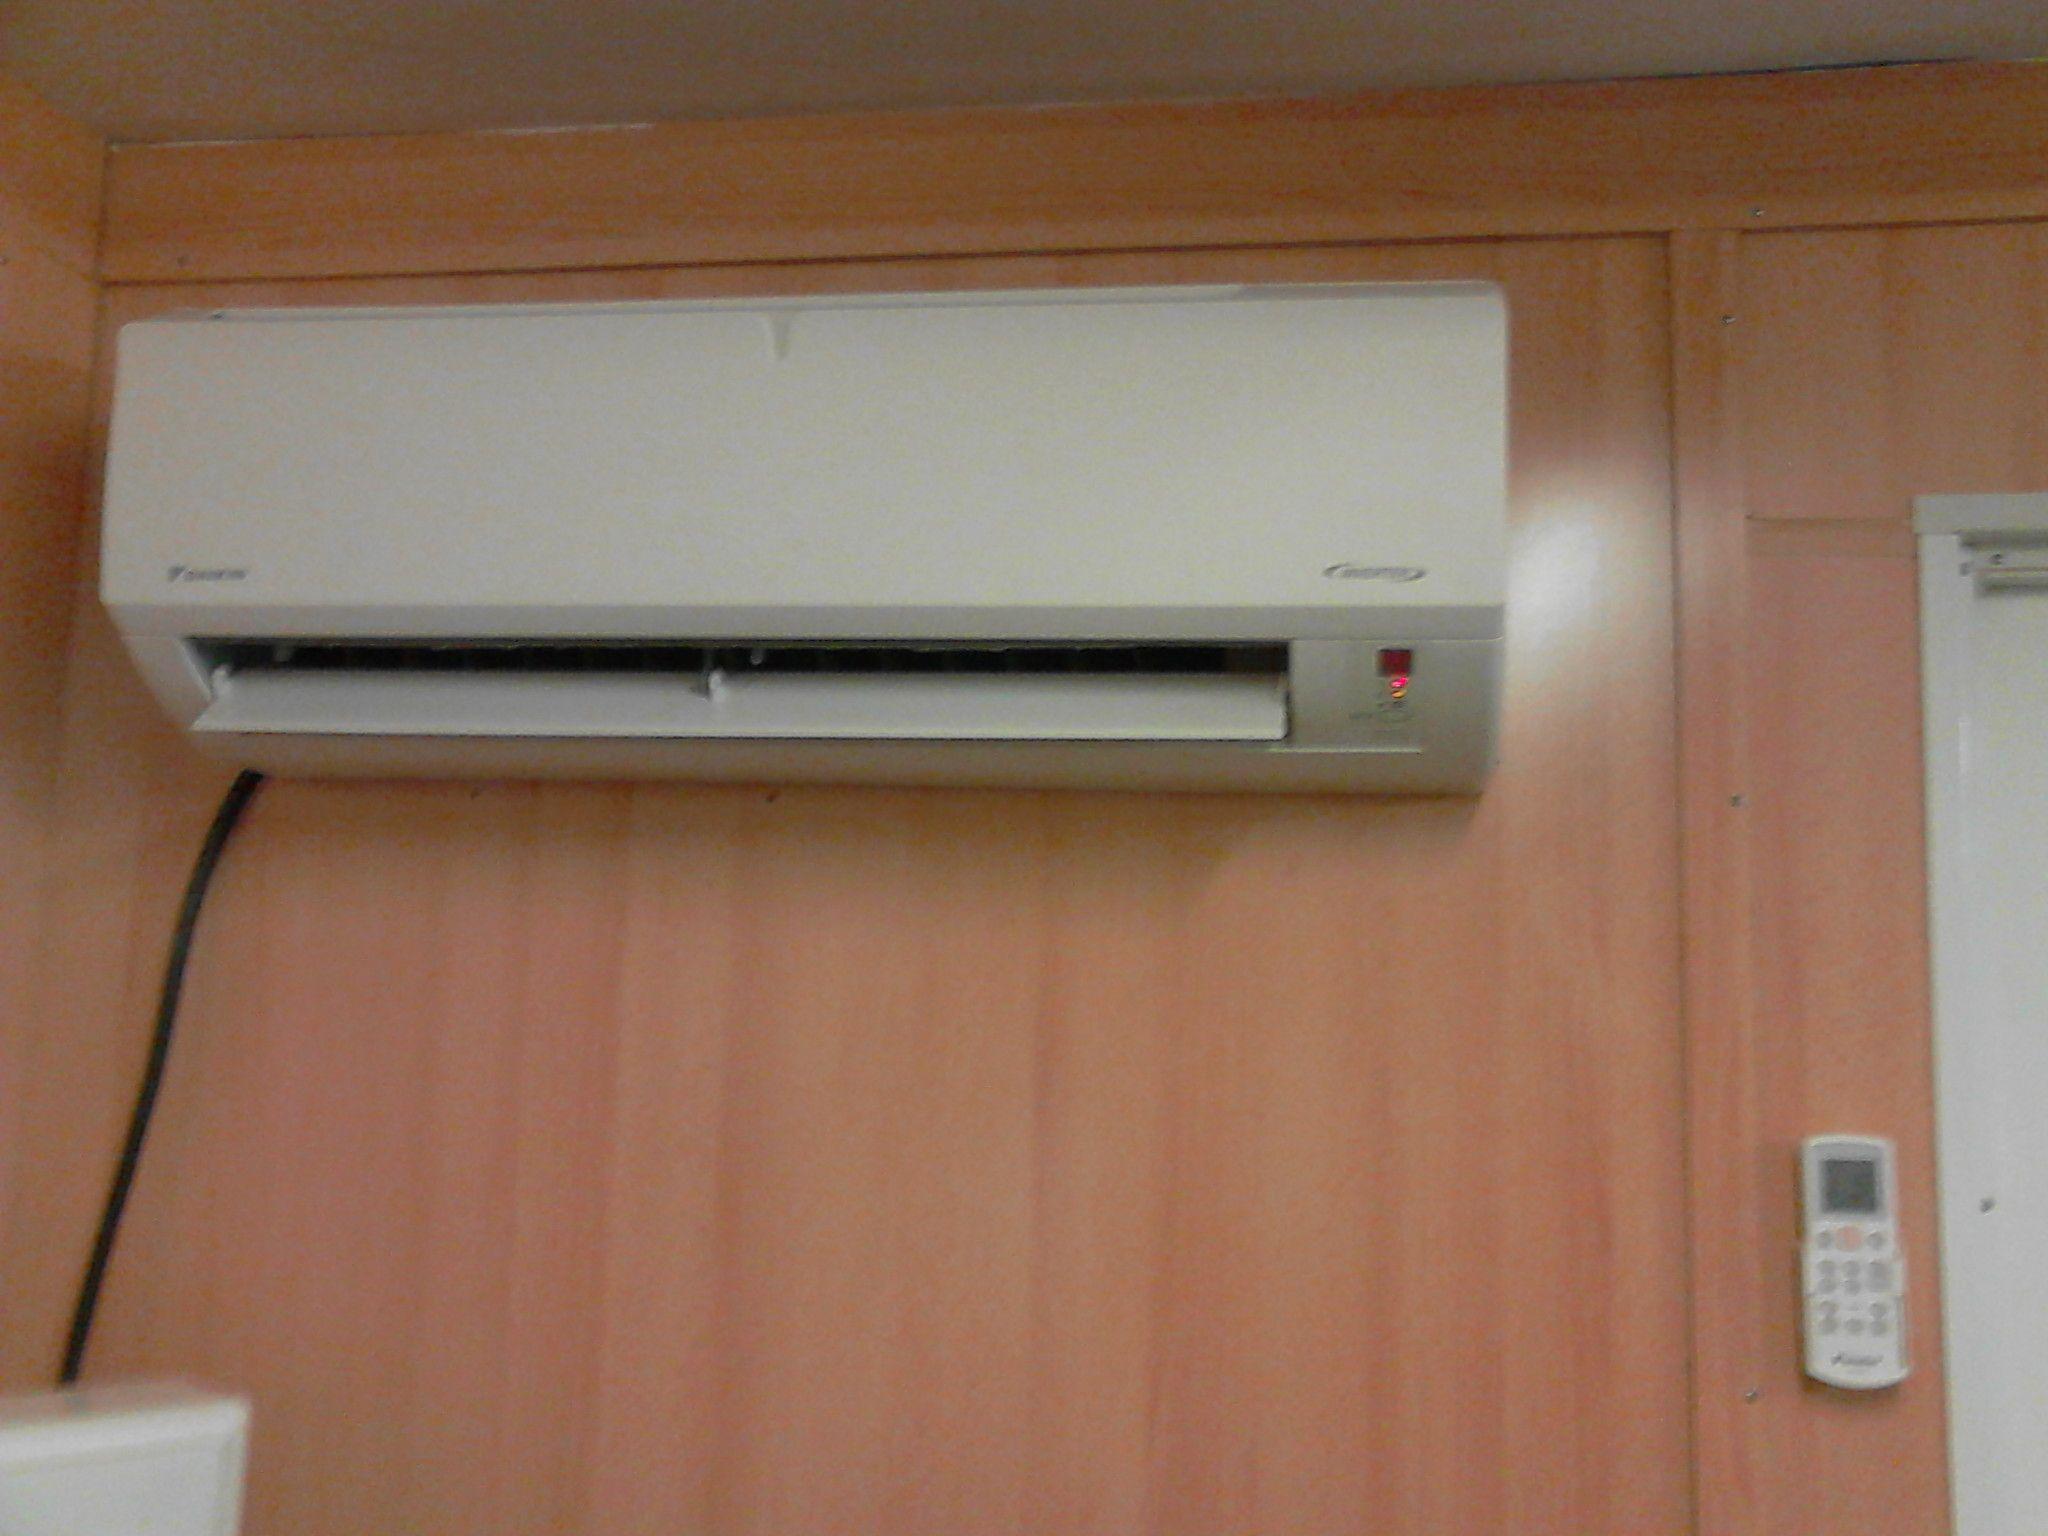 Instalare aer conditionat Daikin ! http//www